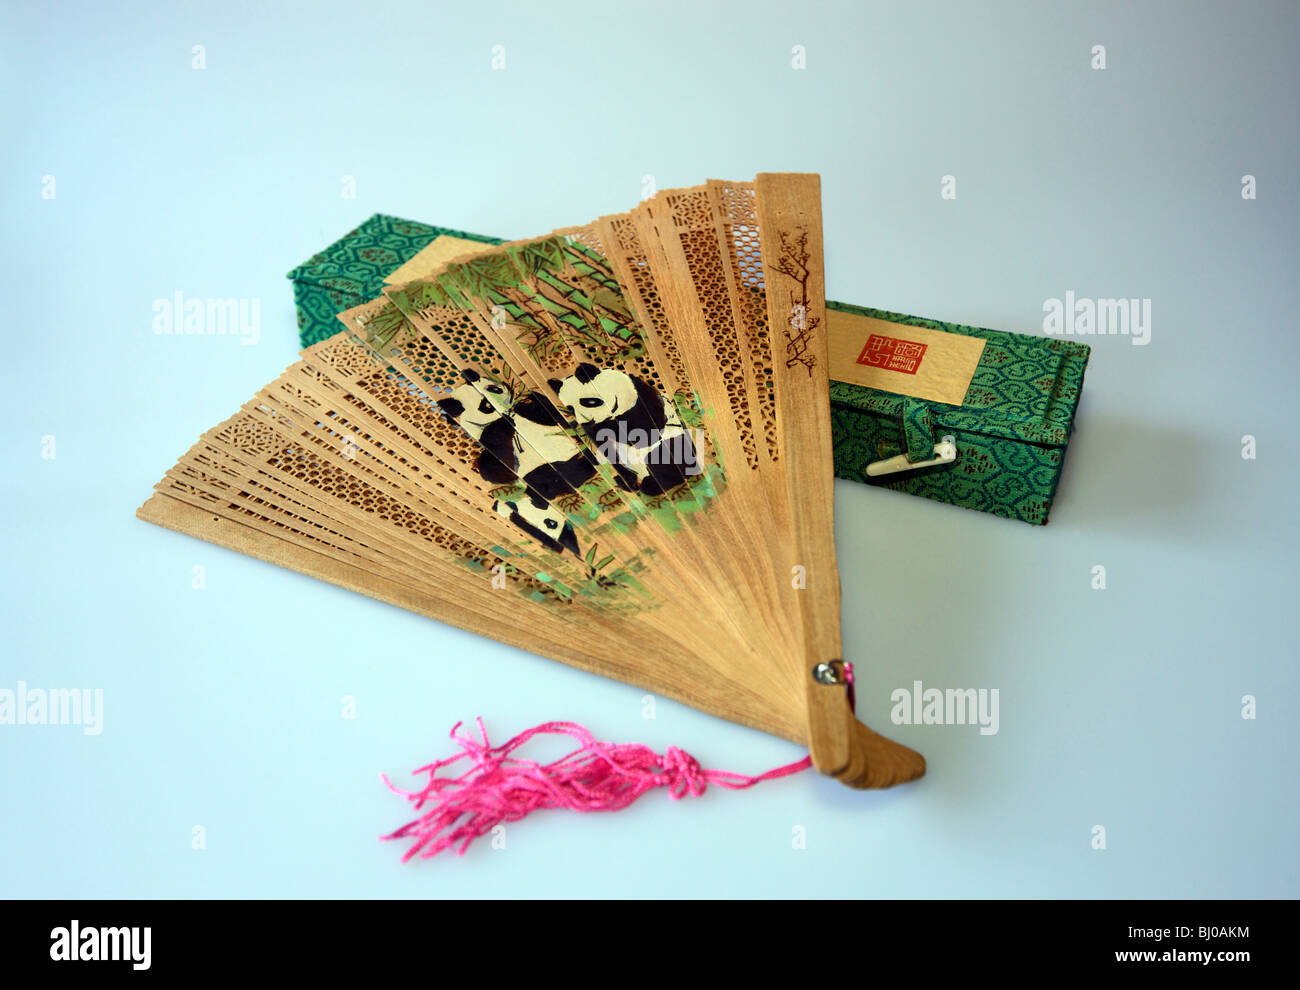 Chinese sandalwood fan with pandas Stock Photo: 28282568 - Alamy